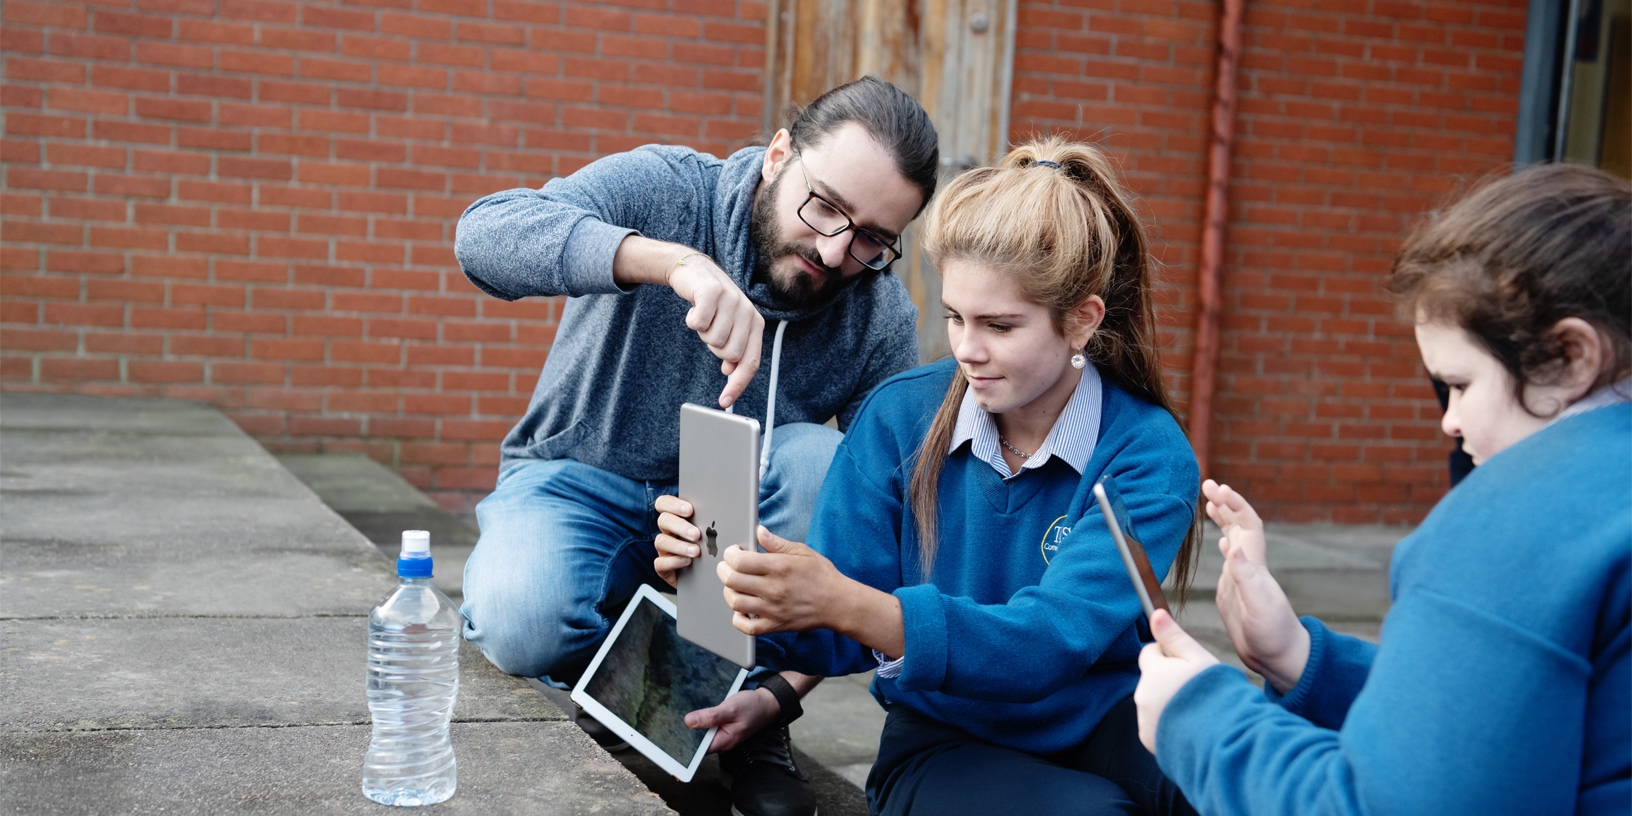 Apple's employee charitable giving program topped $125 million in 2018 donations, Apple highlights volunteering efforts